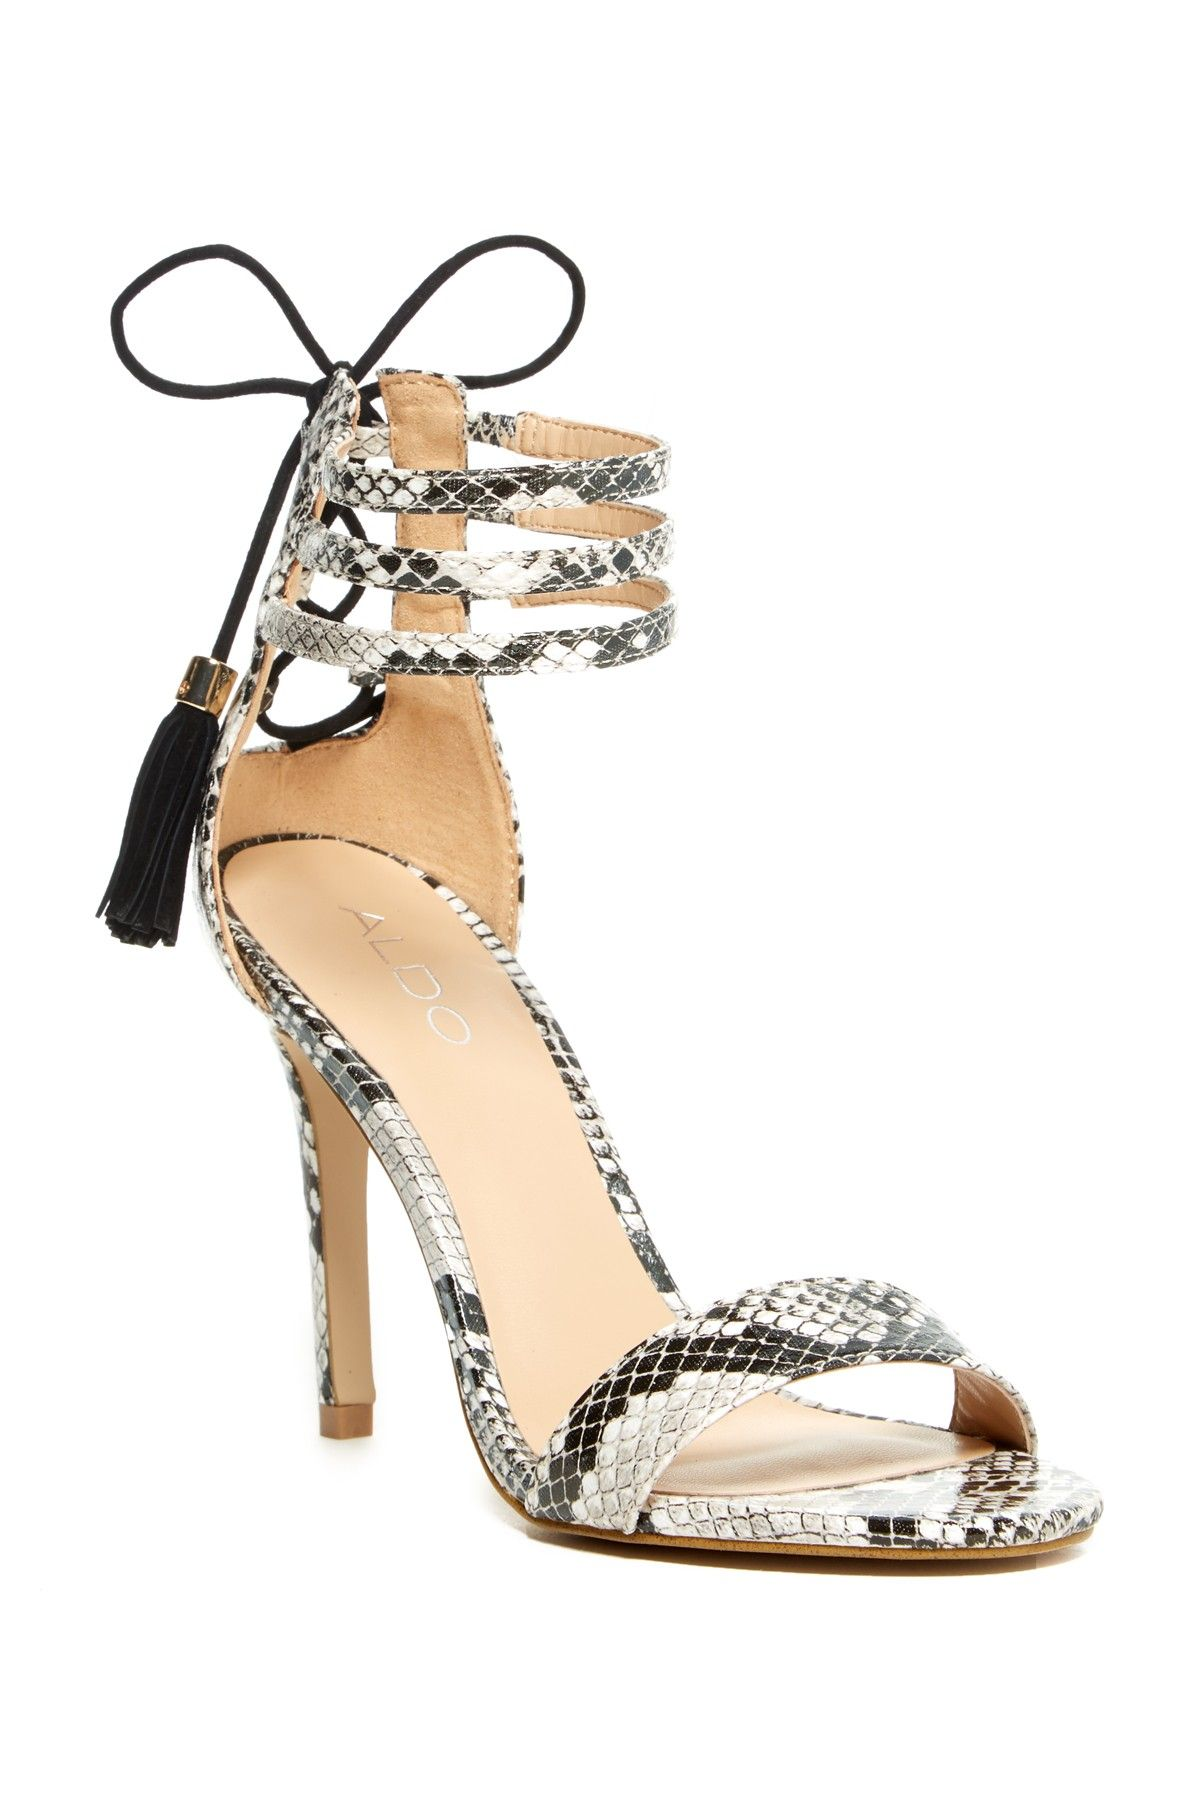 237332cdaf2e Thaviel Ankle Strap Stiletto Sandal by Aldo on  nordstrom rack